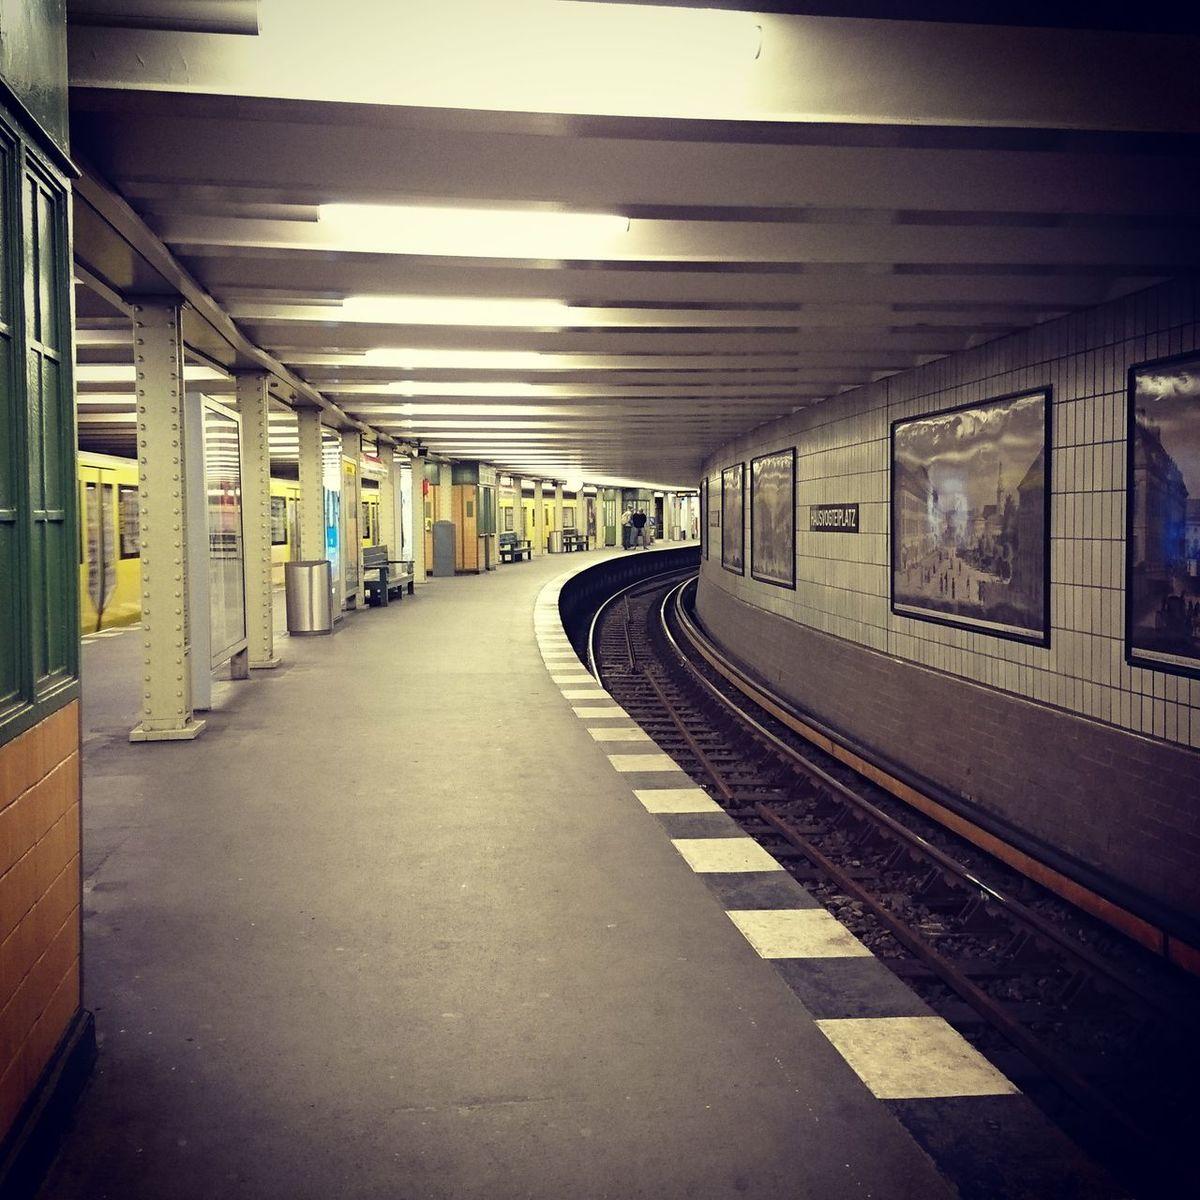 Station Station Platform Perspective Photography Train Station Metro Station